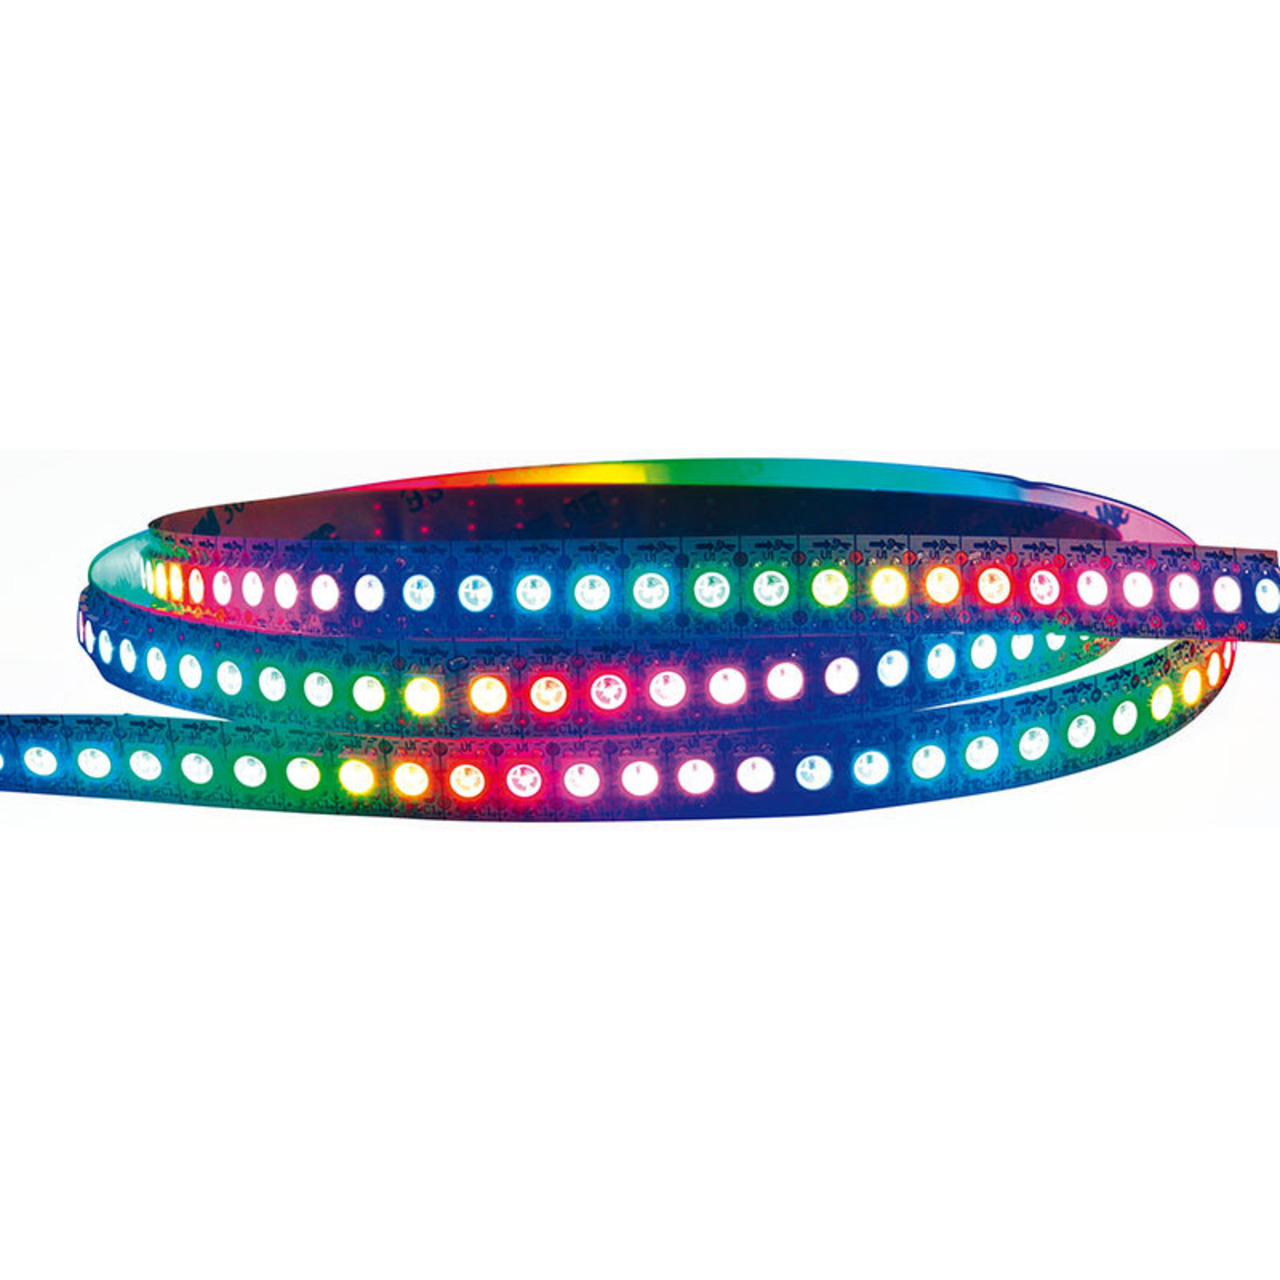 Diamex 2-m-LED-Streifen mit WS2812-kompatiblen-LEDs- 144 LEDs-m- schwarze Platine